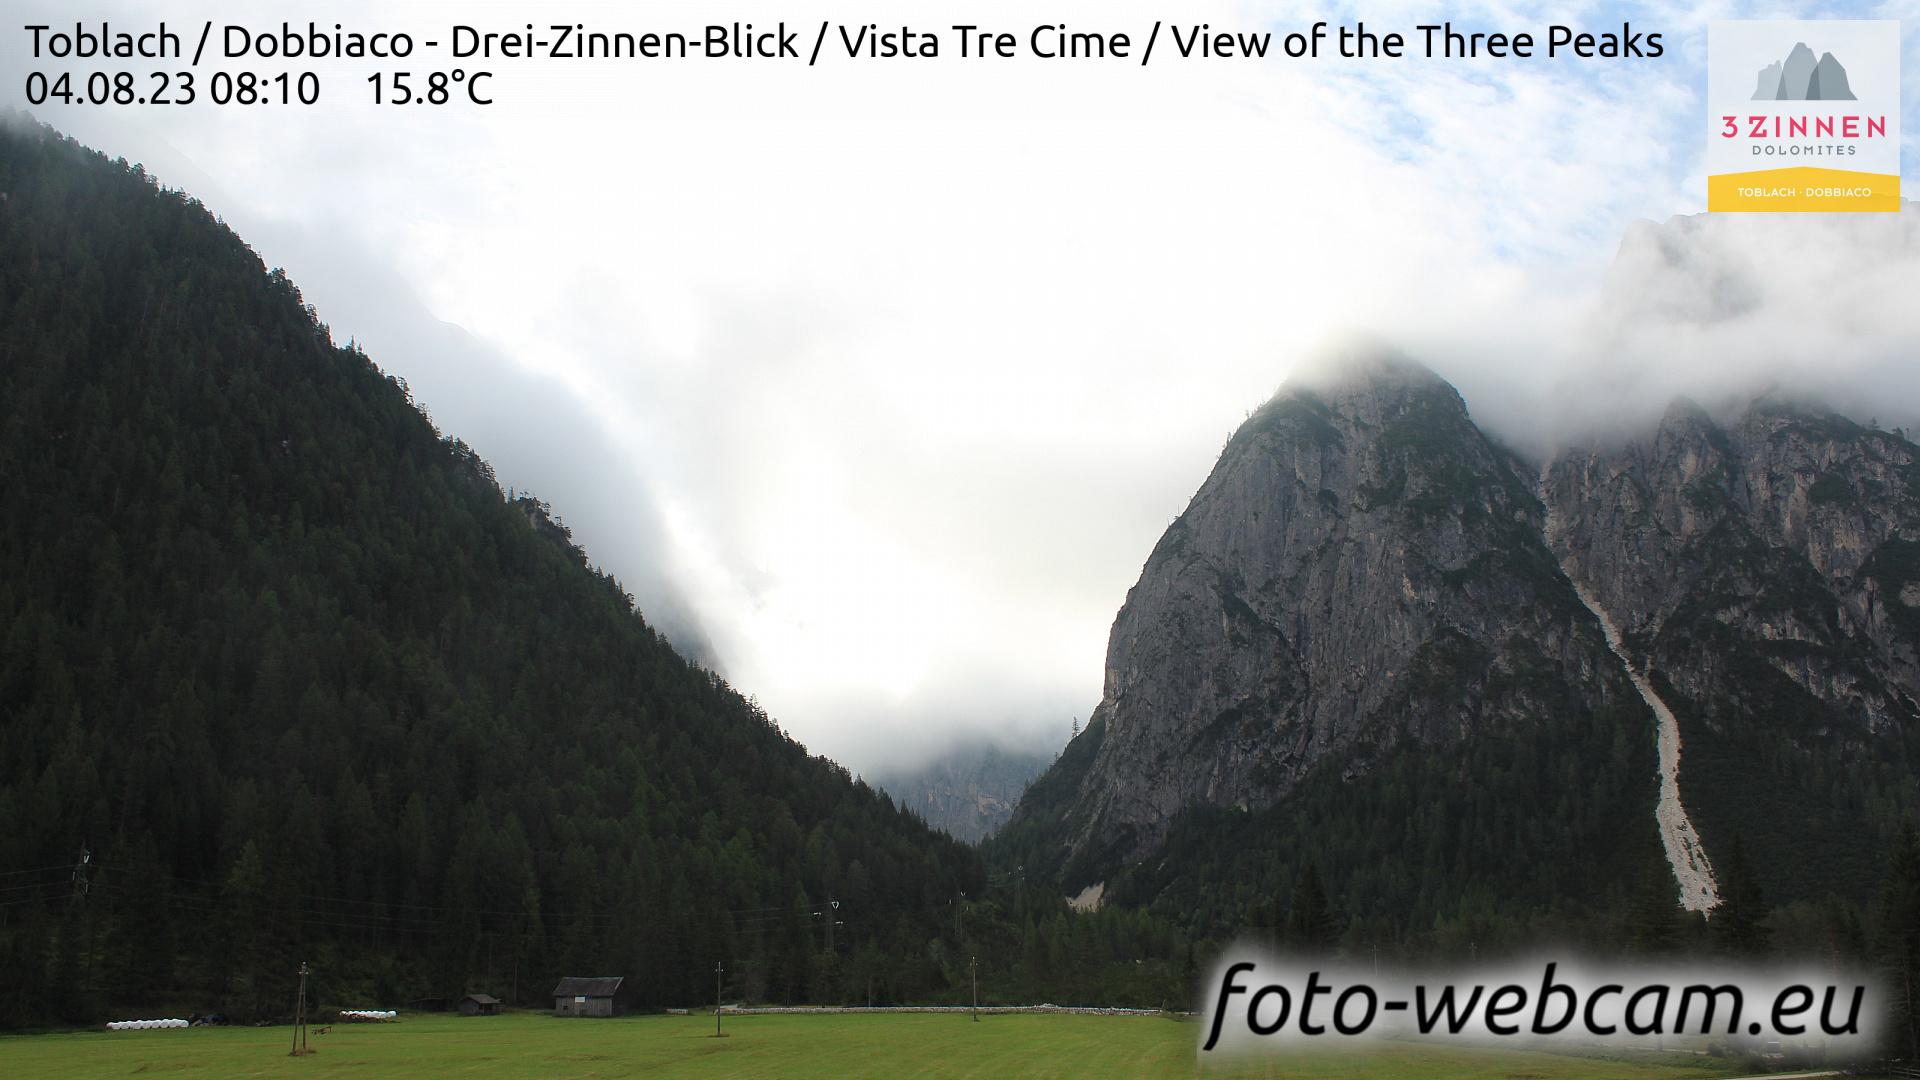 Toblach (Dolomiten) Do. 08:27